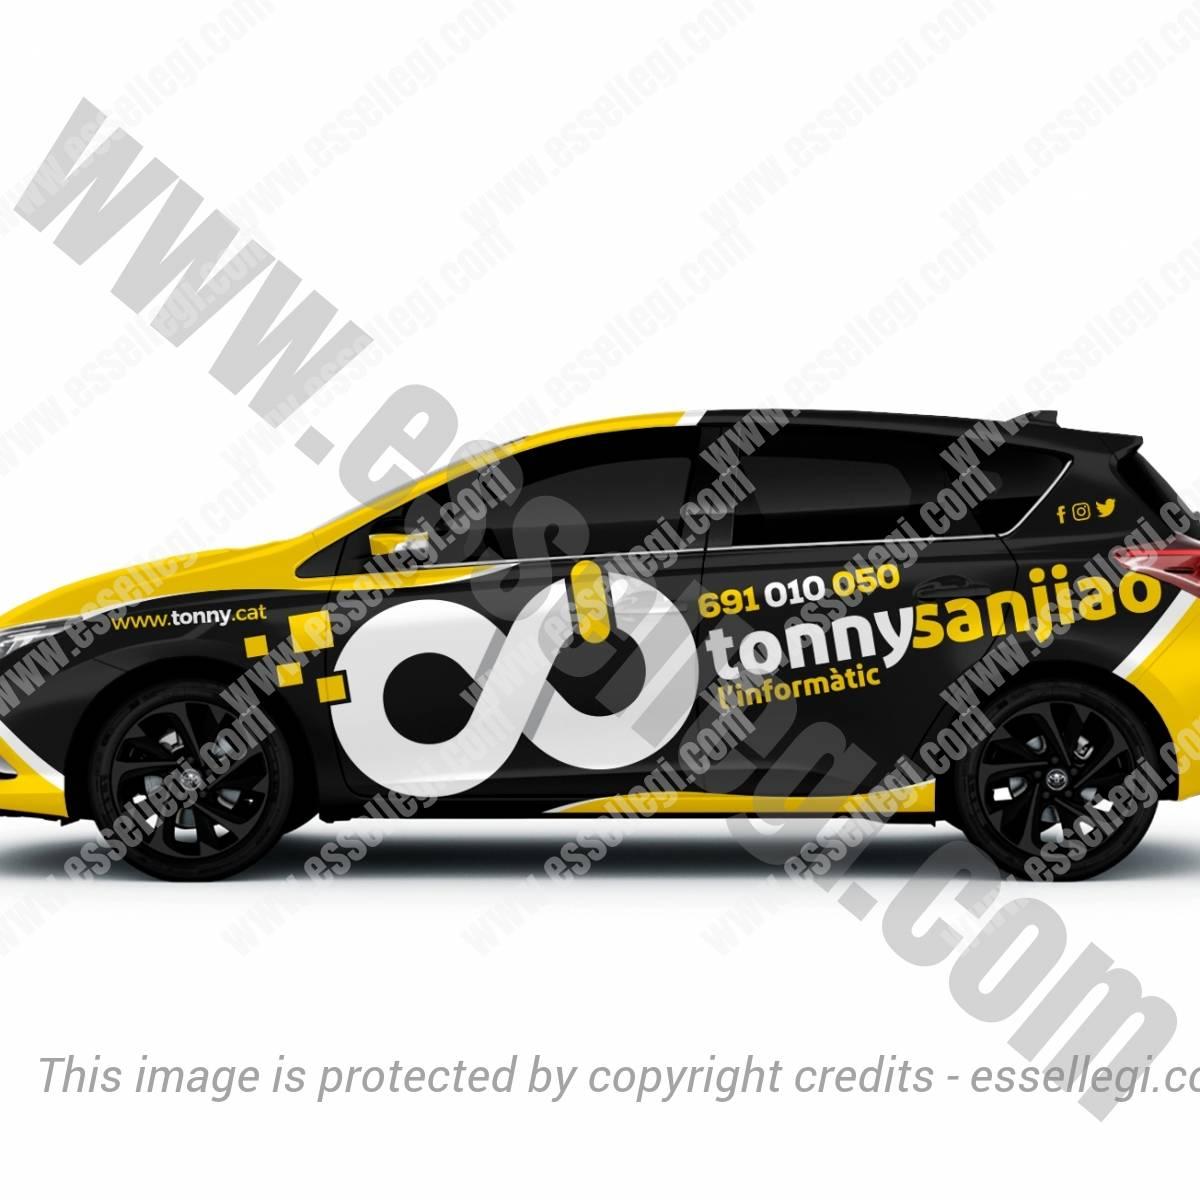 TONNY SANJIAO – L'INFORMATIC | CAR WRAP DESIGN 🇪🇸